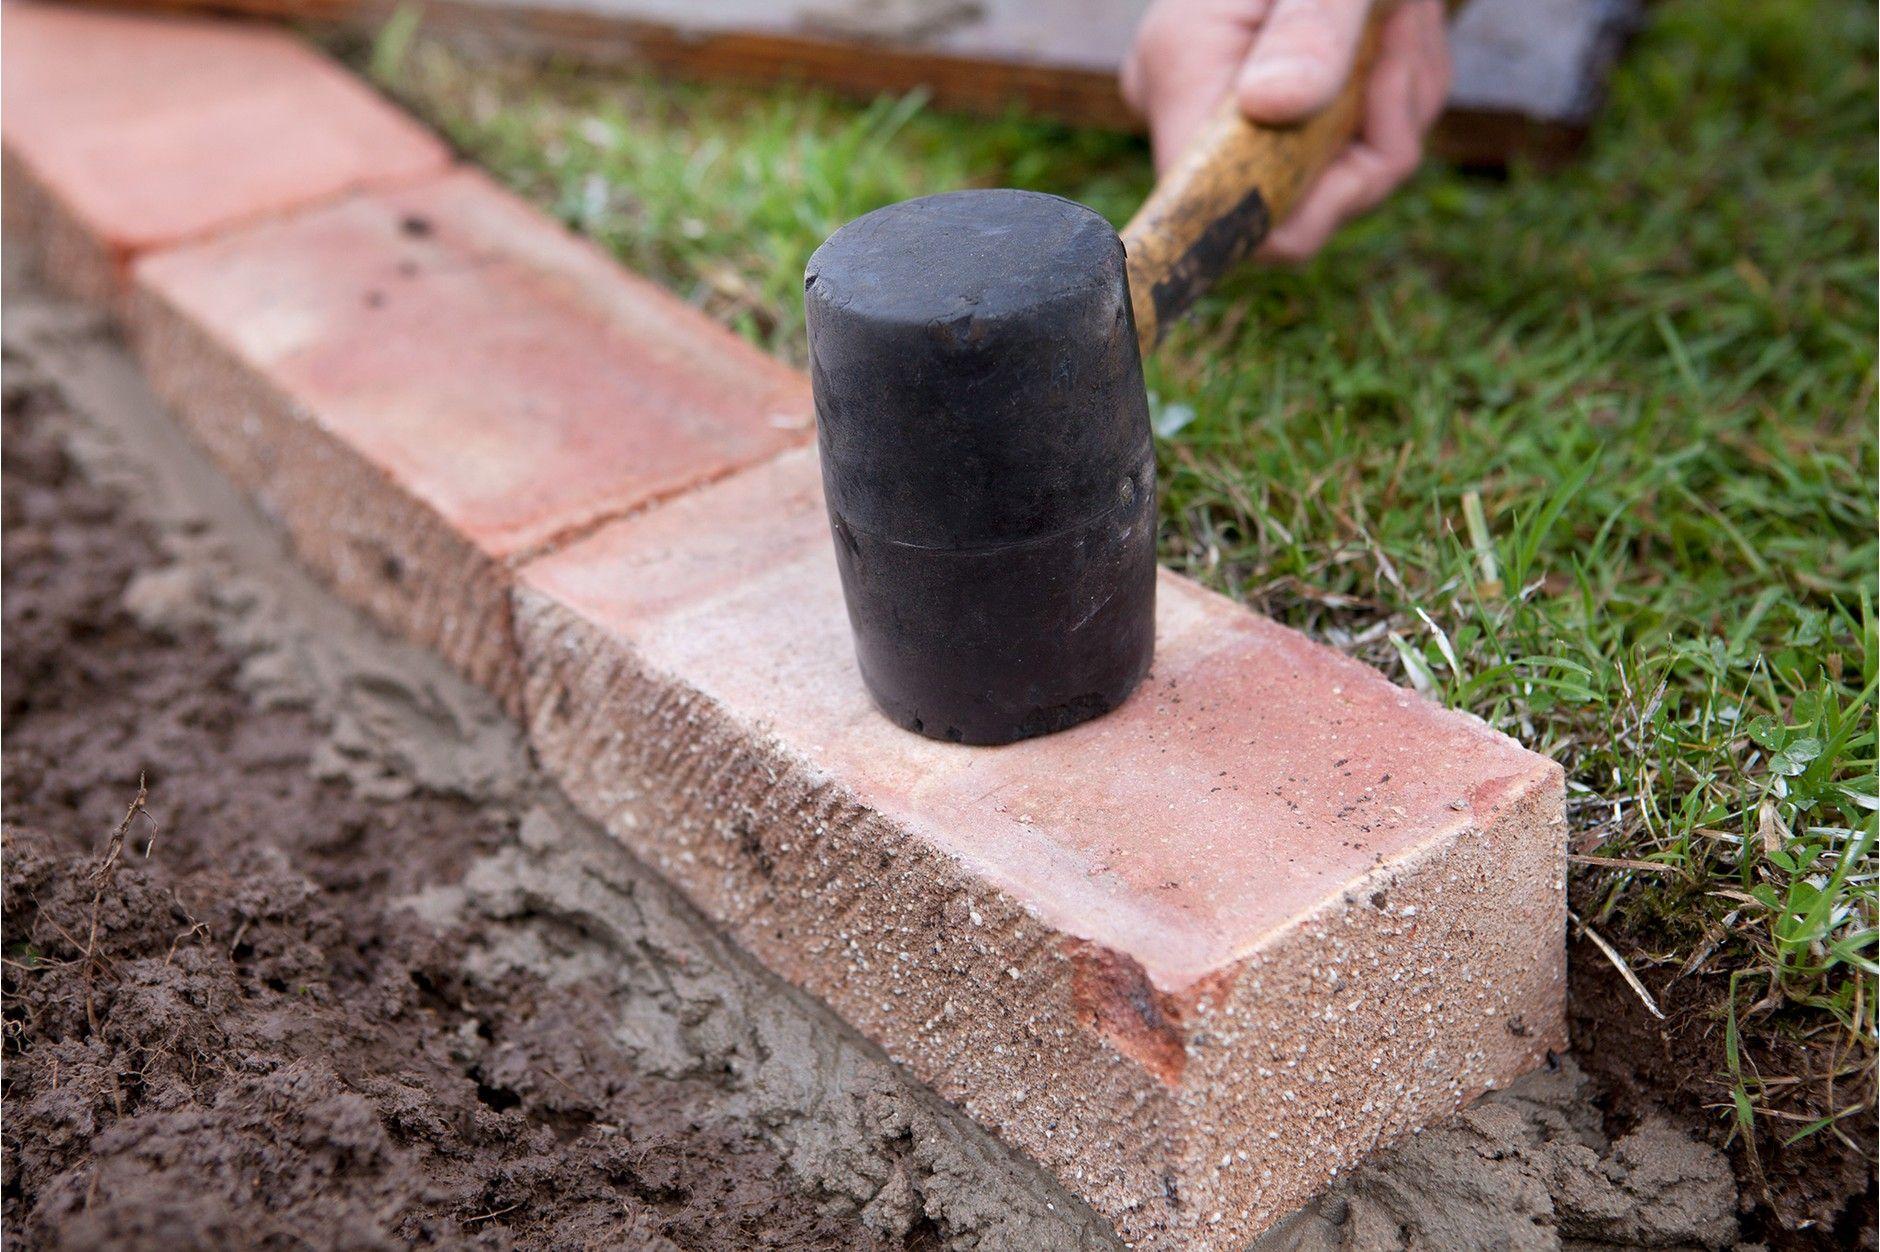 How To Edge A Lawn With Bricks Brick Garden Edging 400 x 300